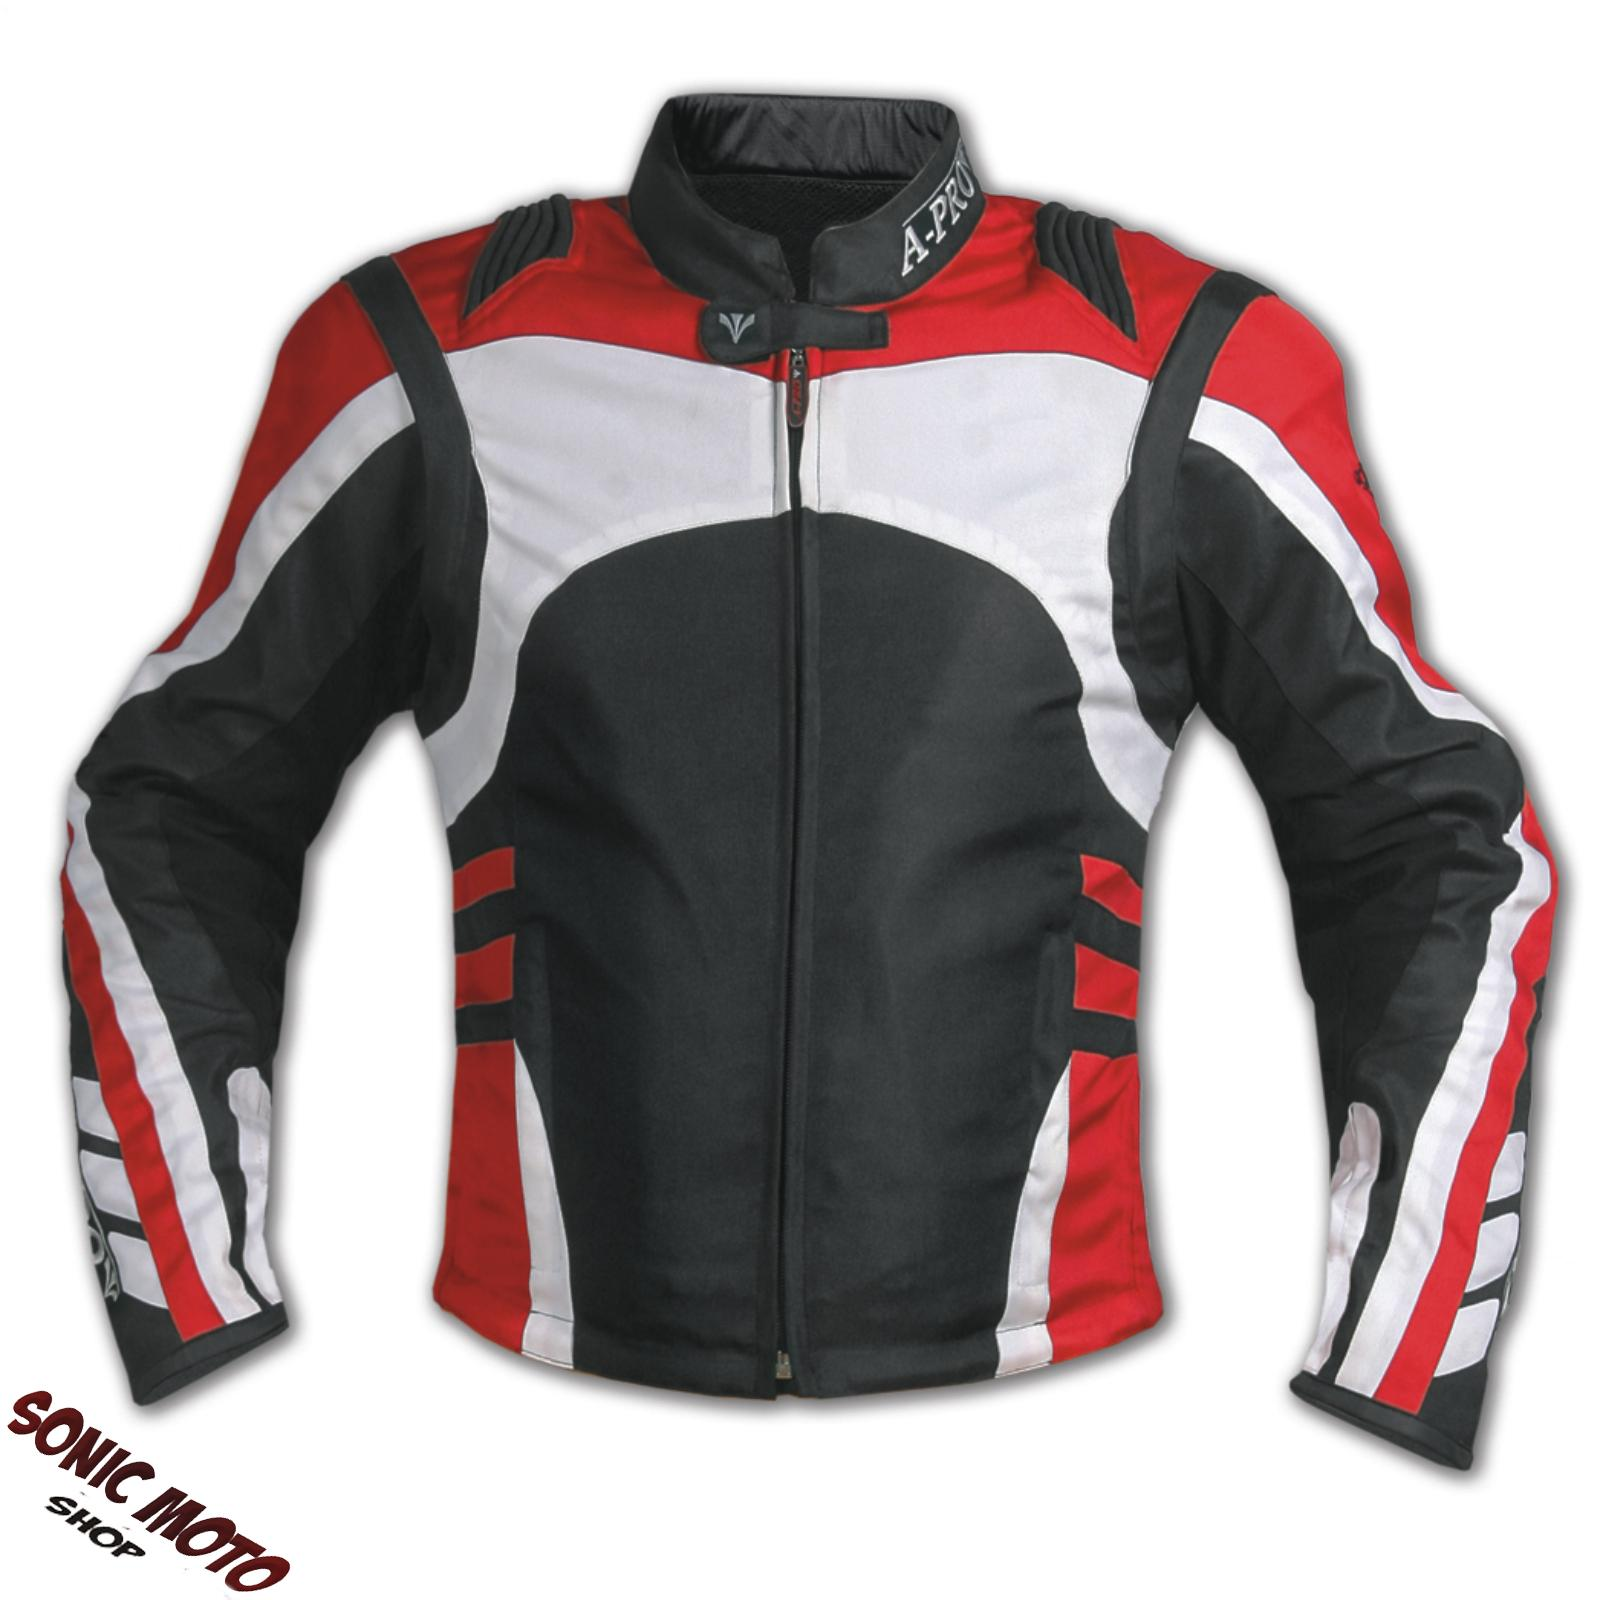 Cordura-Moto-Jacket-manga-desmontable-Racing-Sport-Touring-Scooter